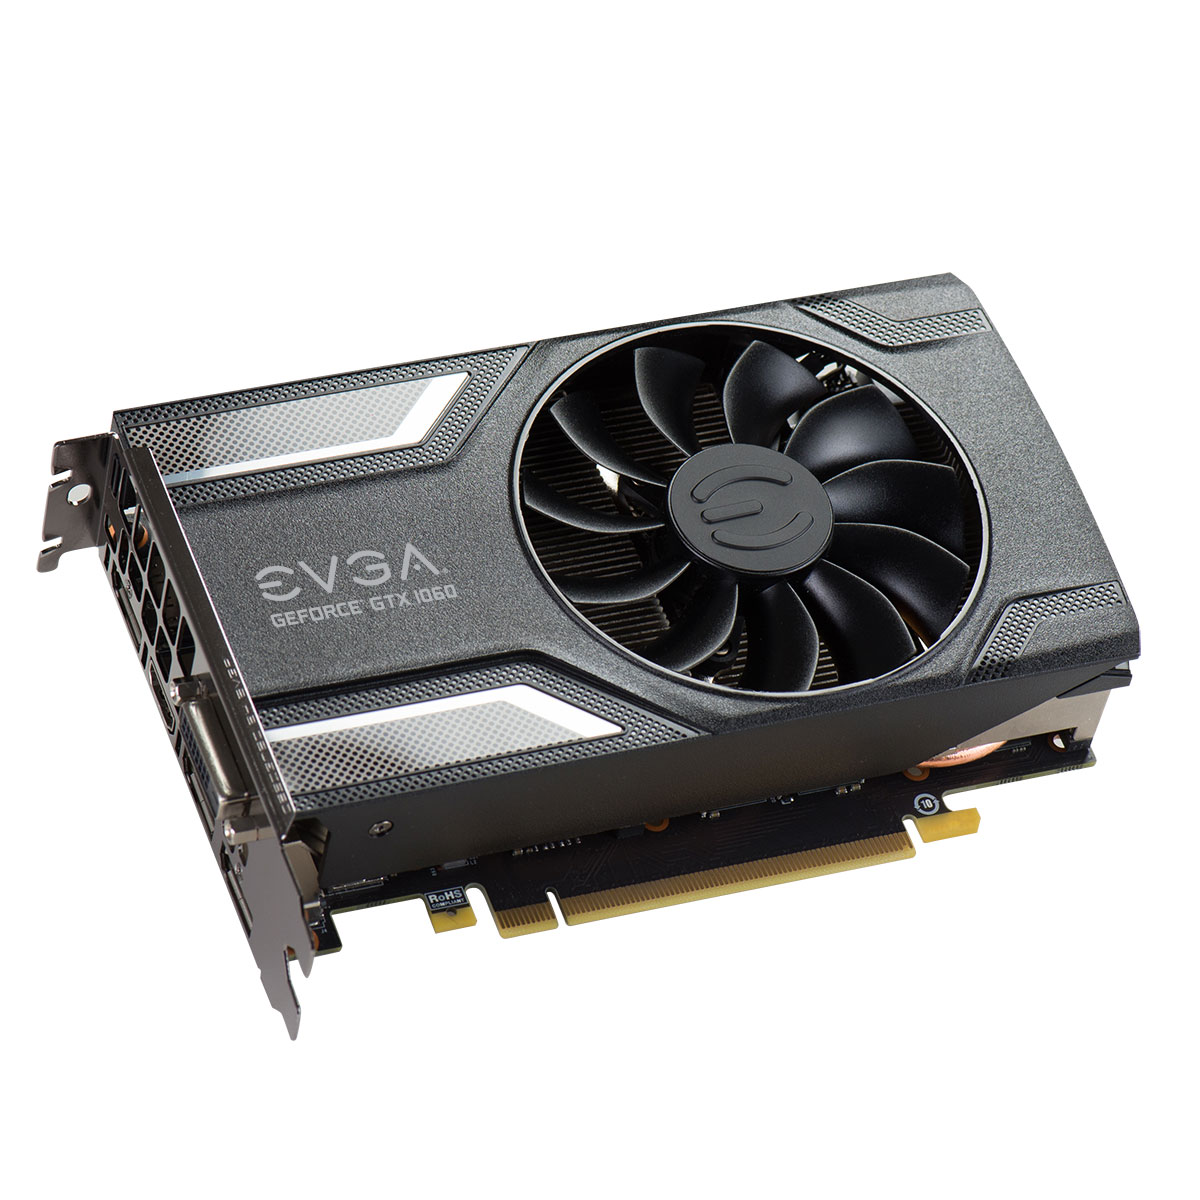 EVGA GeForce GTX 1060 Drivers Download